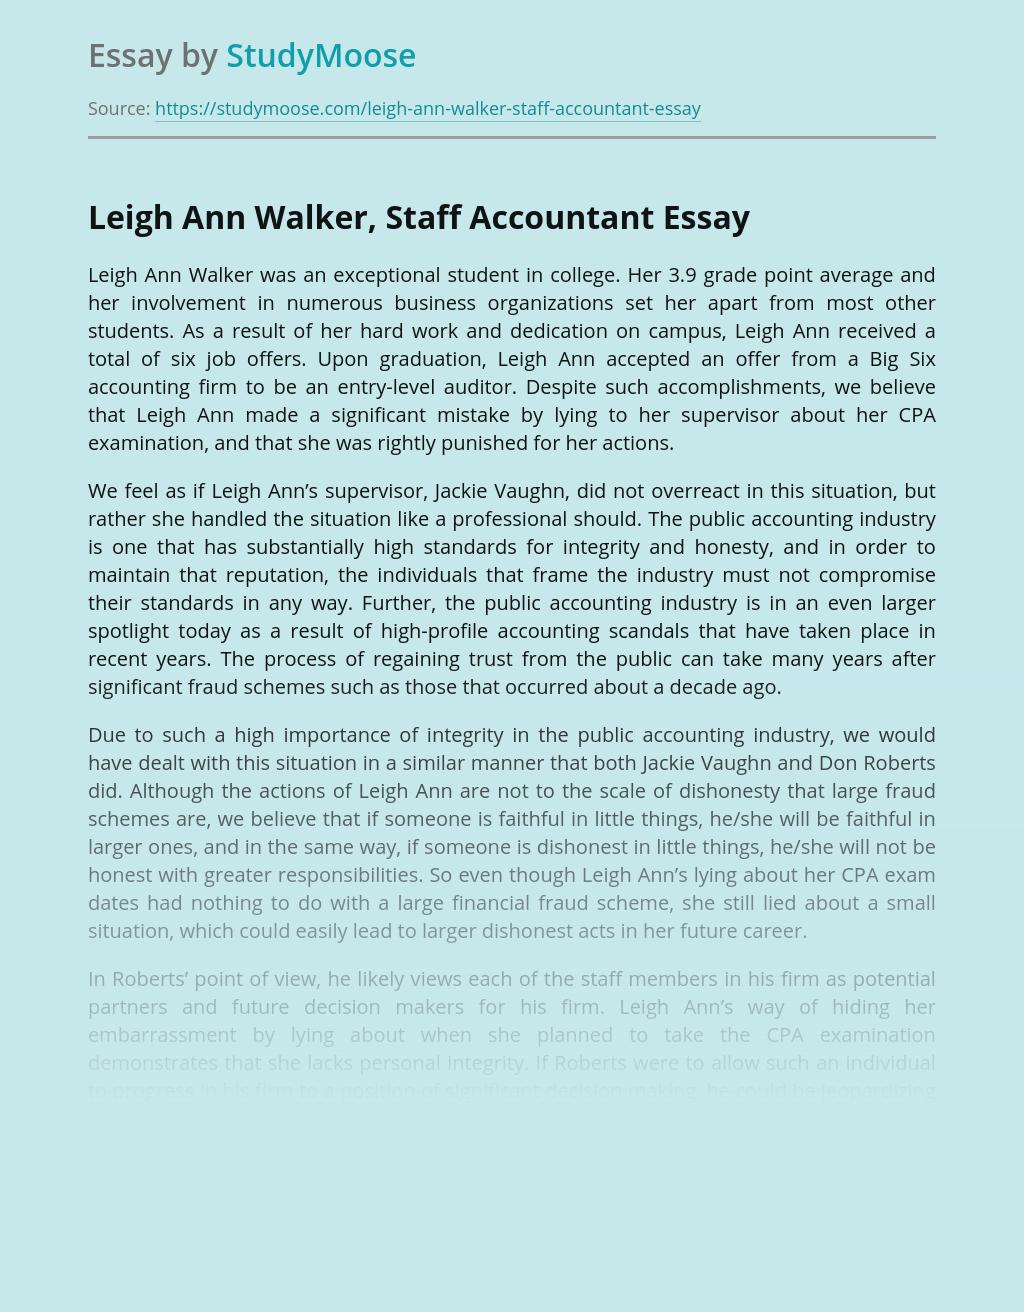 Lies of Leigh Ann Walker, Staff Accountant